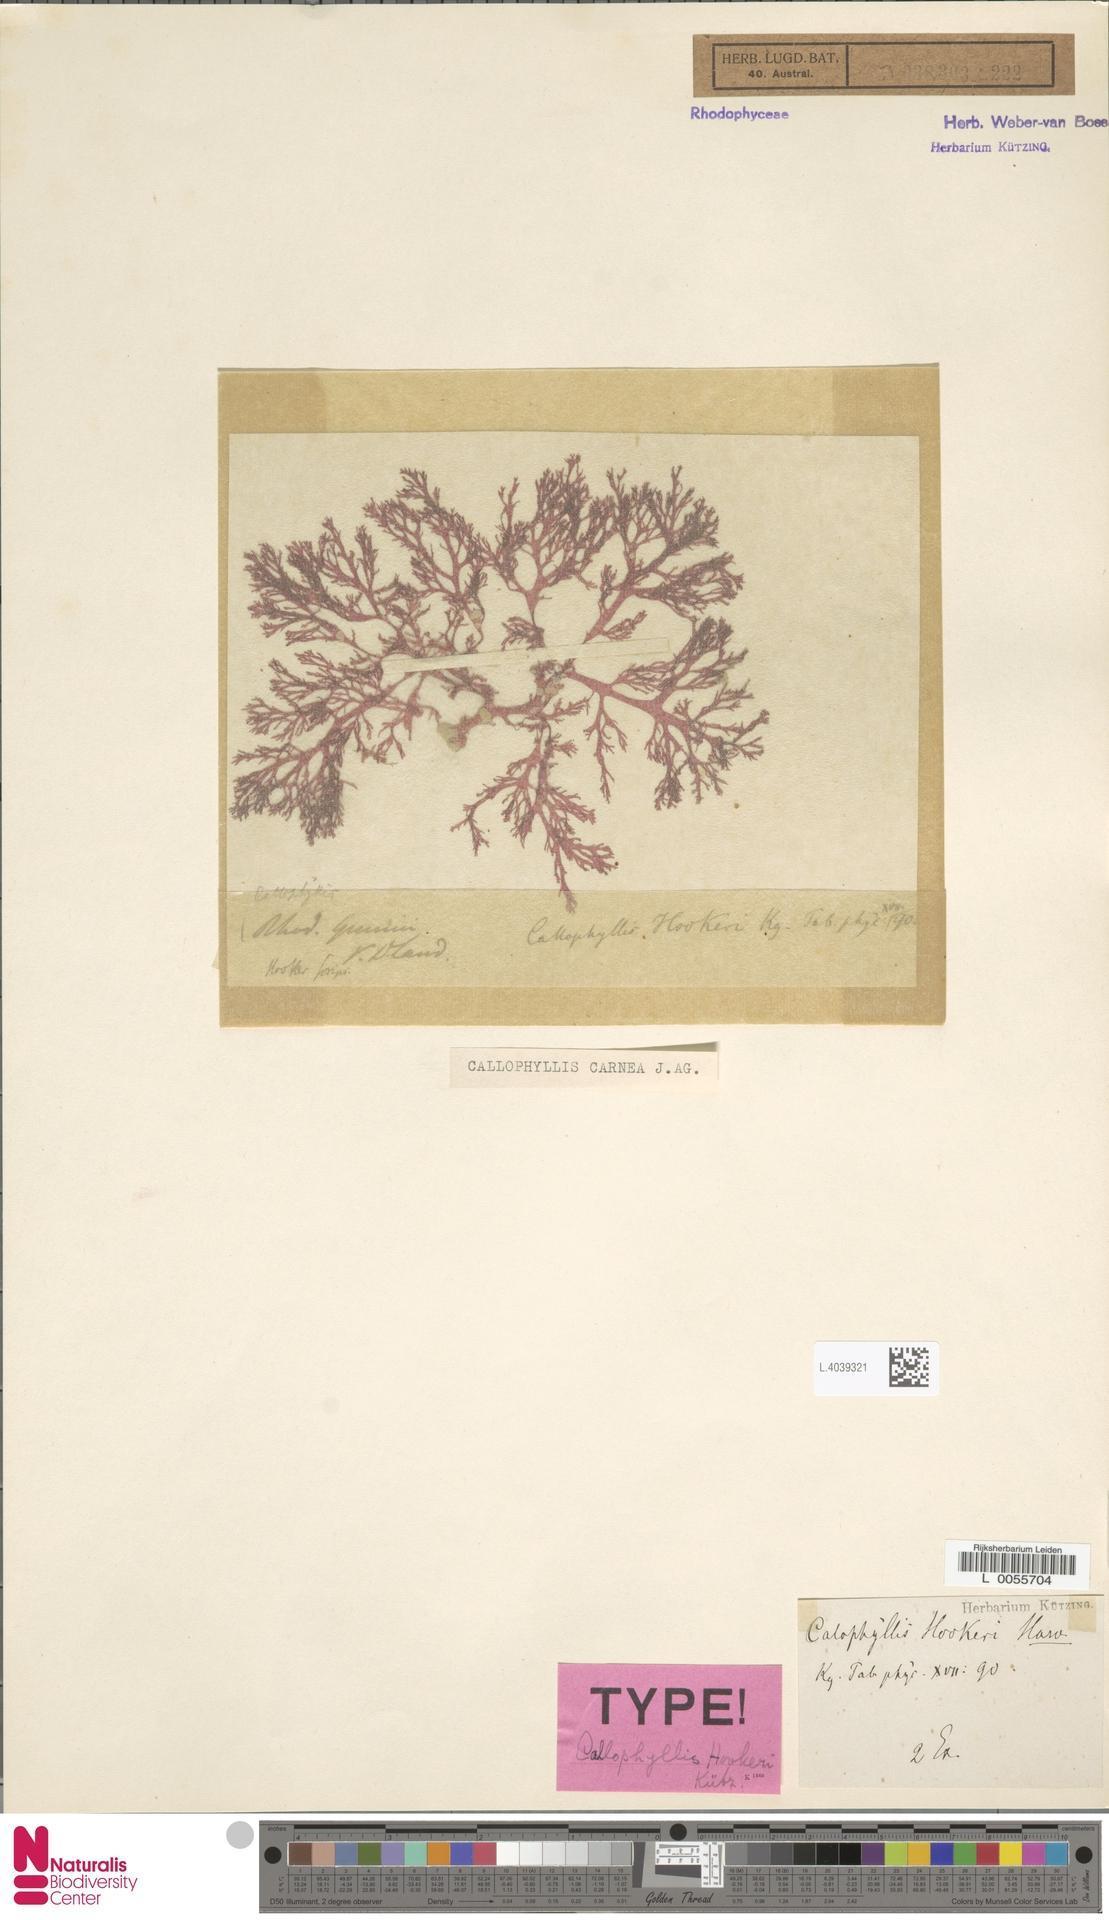 Image of Callophyllis